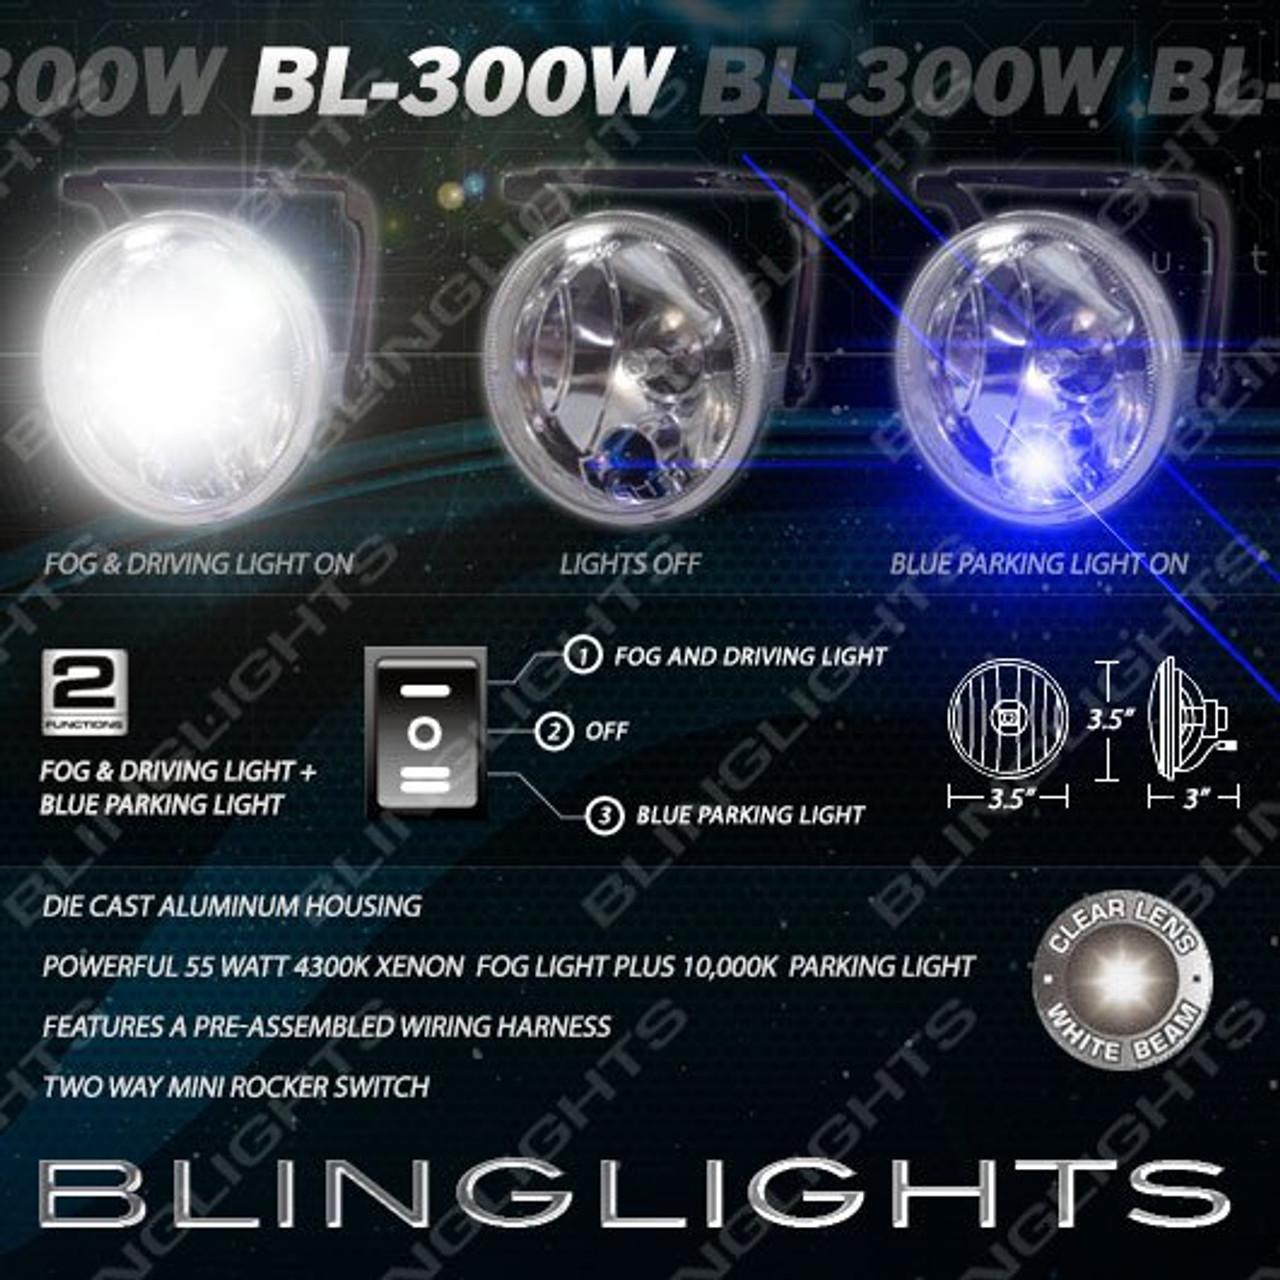 2005 2006 2007 2008 Nissan Xterra Xenon Fog Lamps Lights Kit